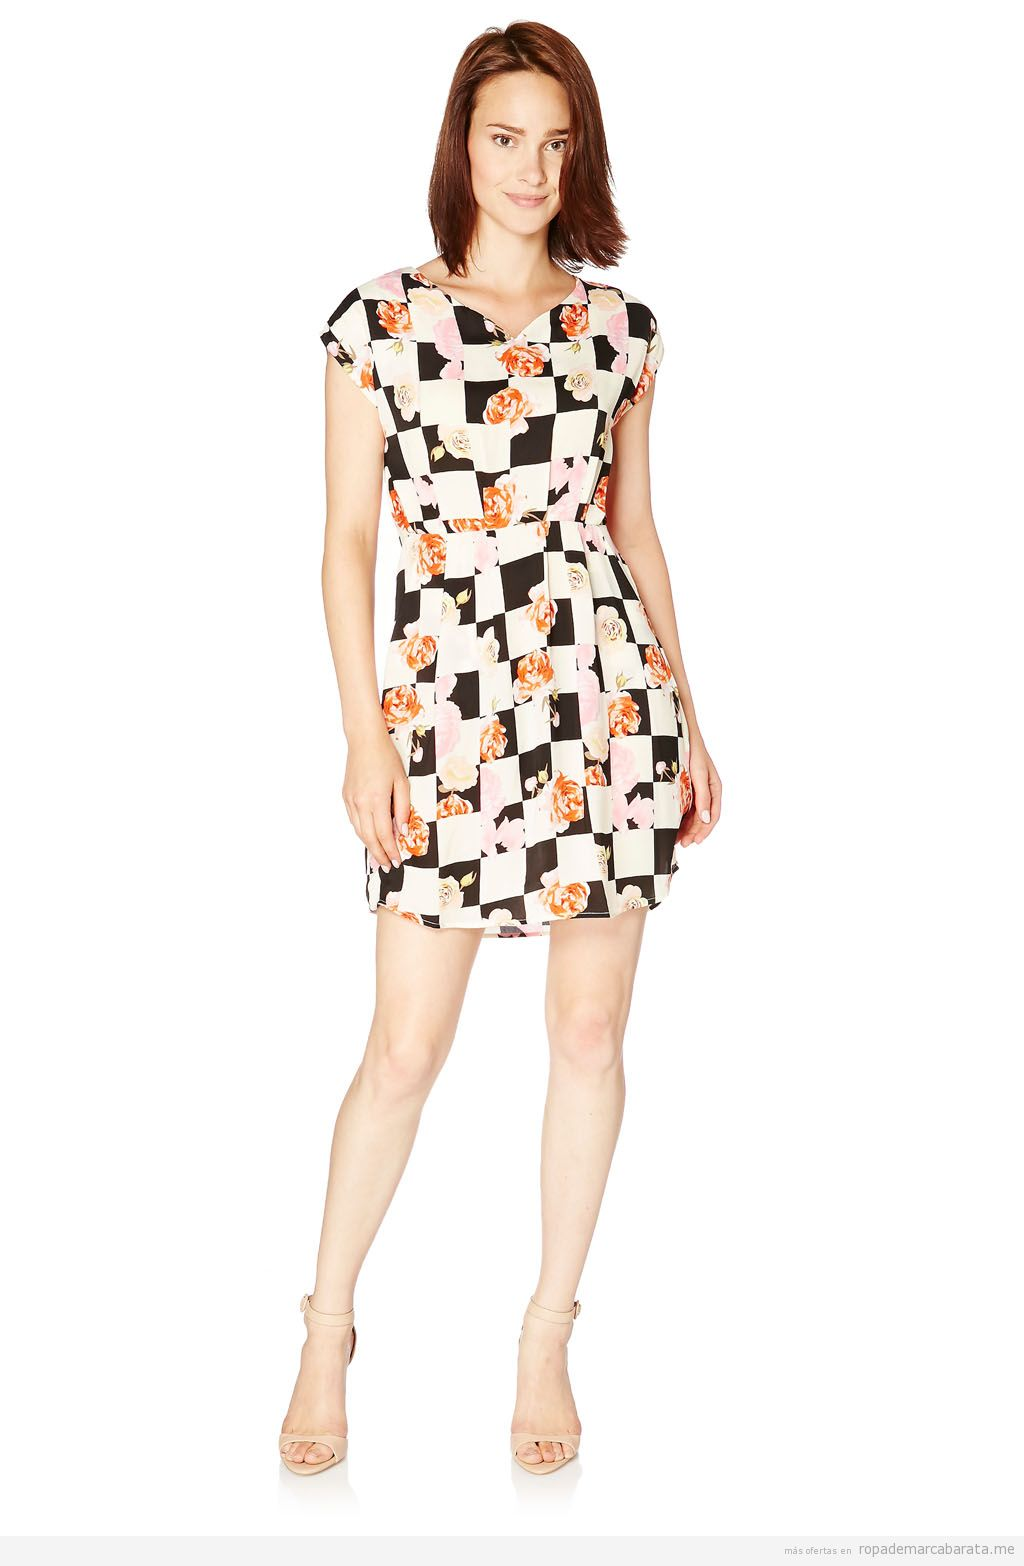 Vestido marca Made for Loving barato, outlet online